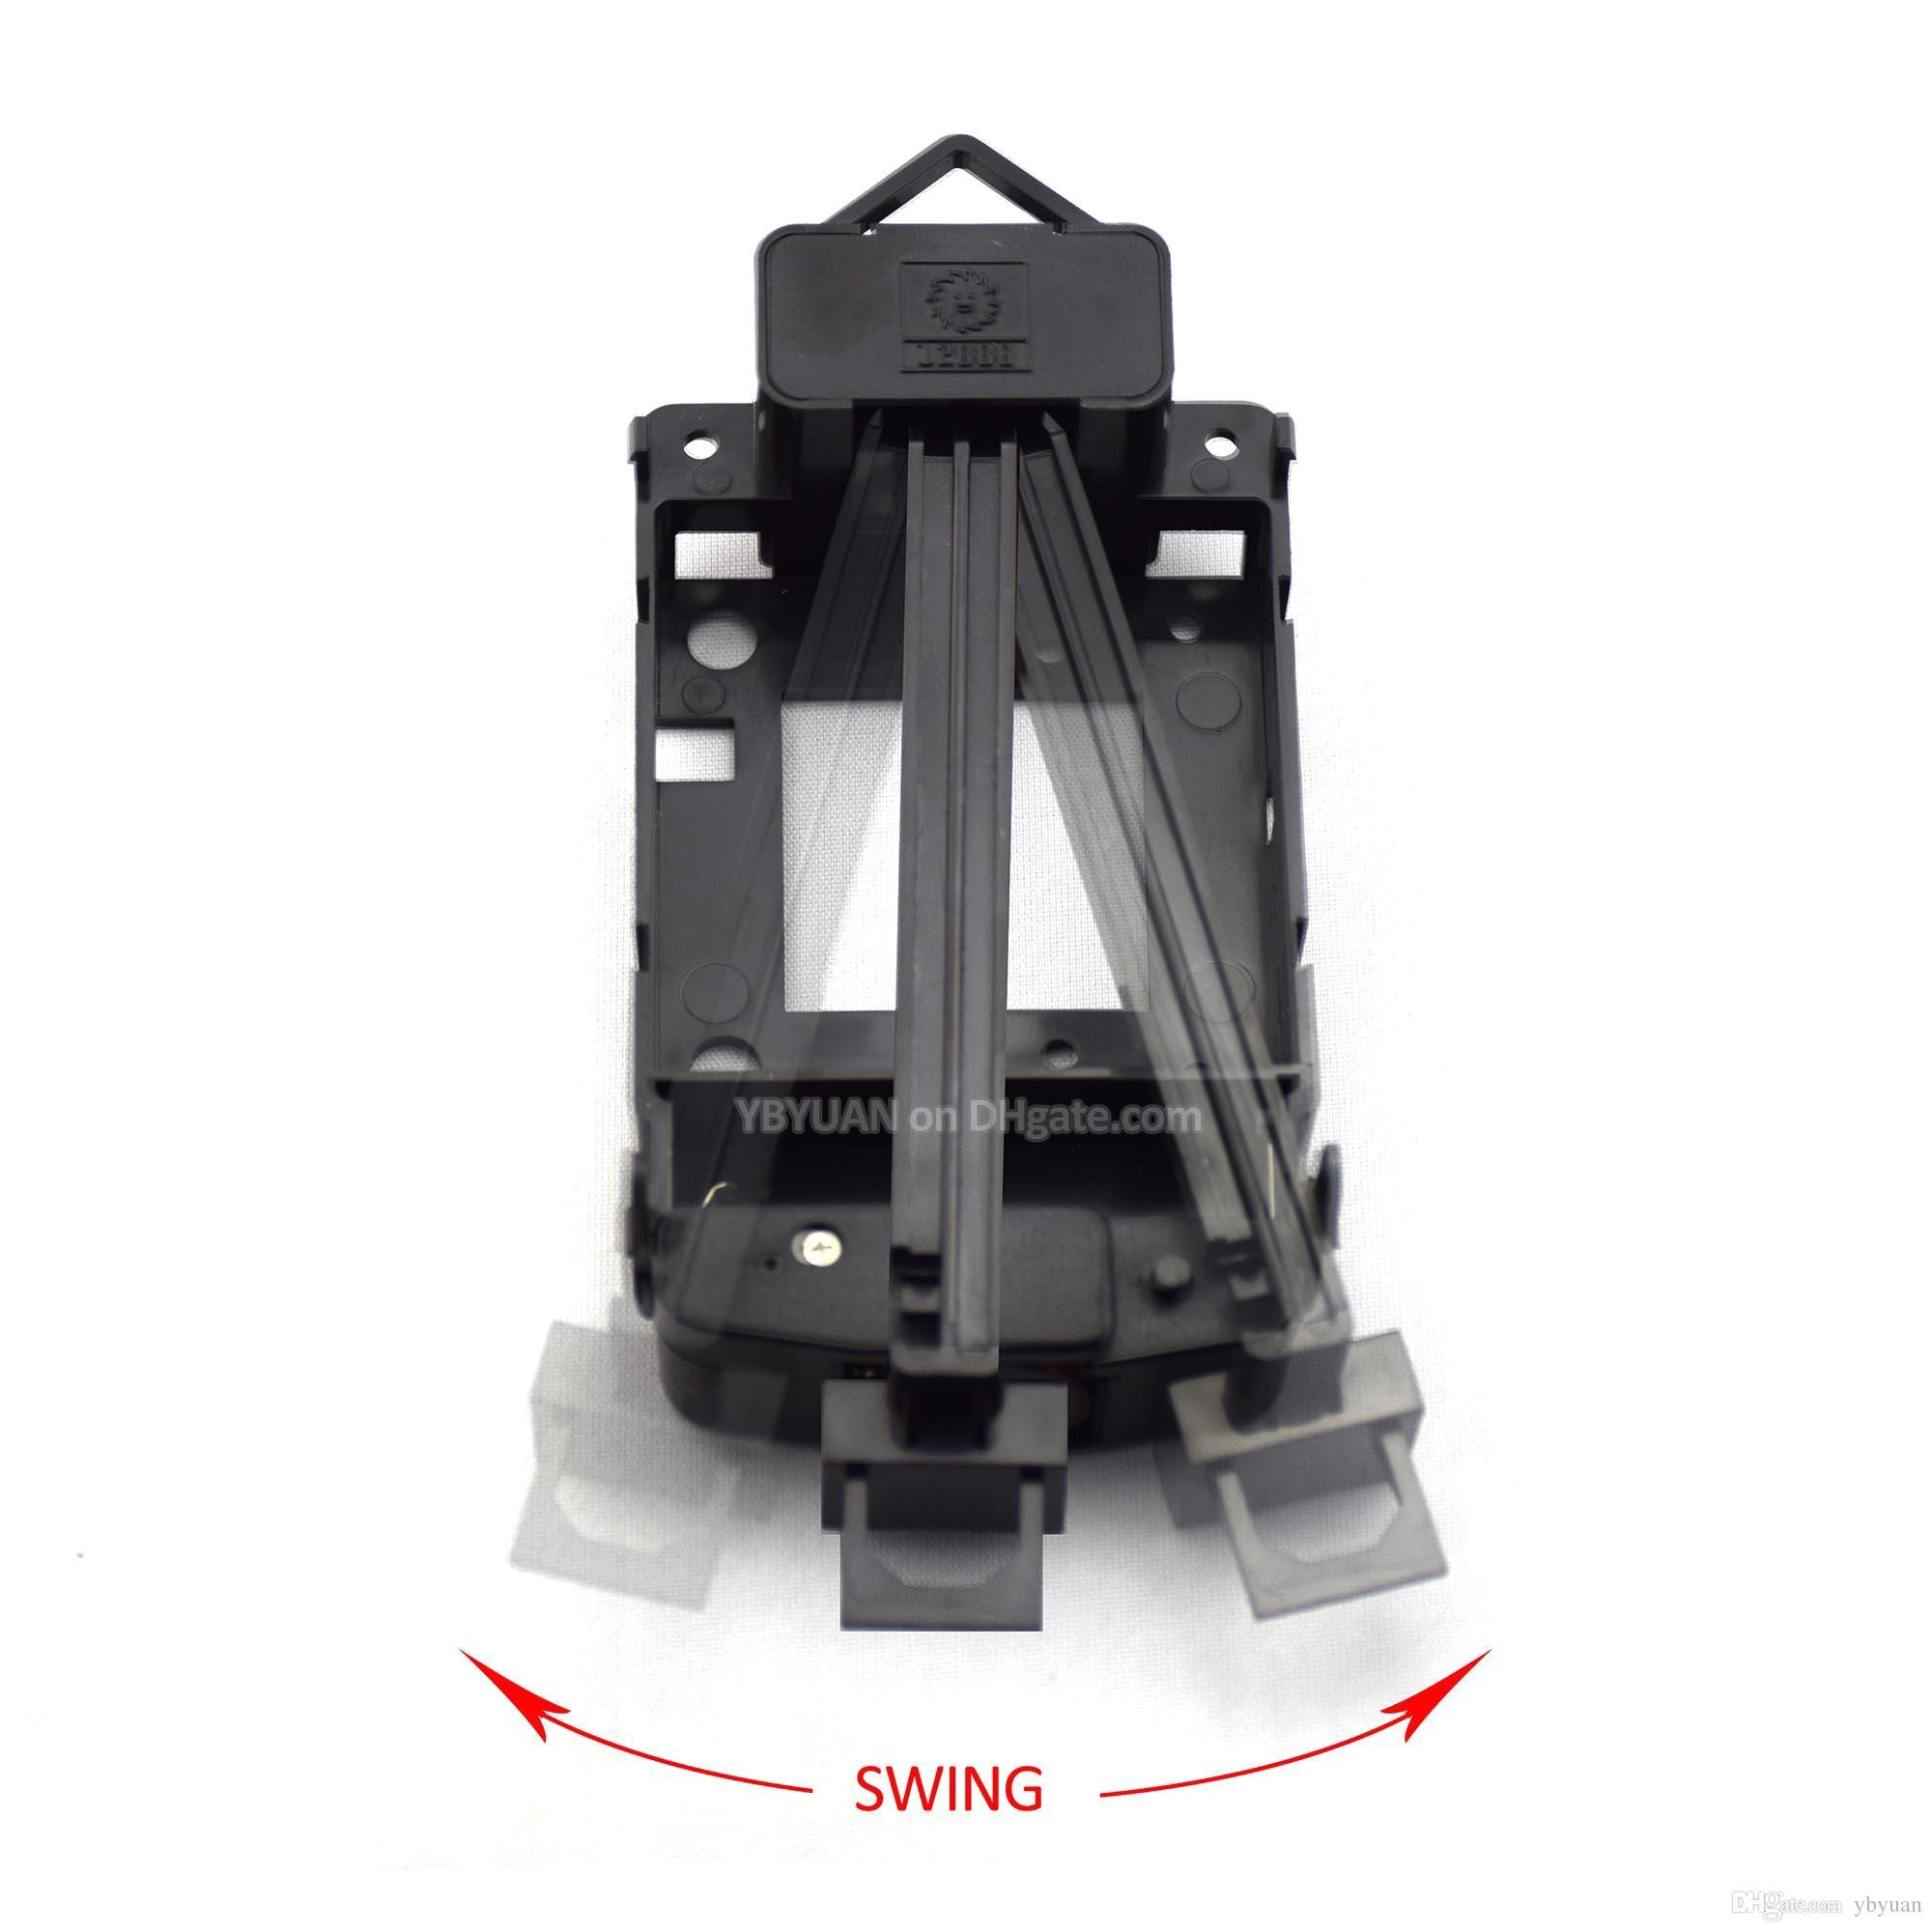 diy general wall clock parts pendulum holder swing device 12888 for timepiece quartz movement mechanism horologe wiggler repair accessories